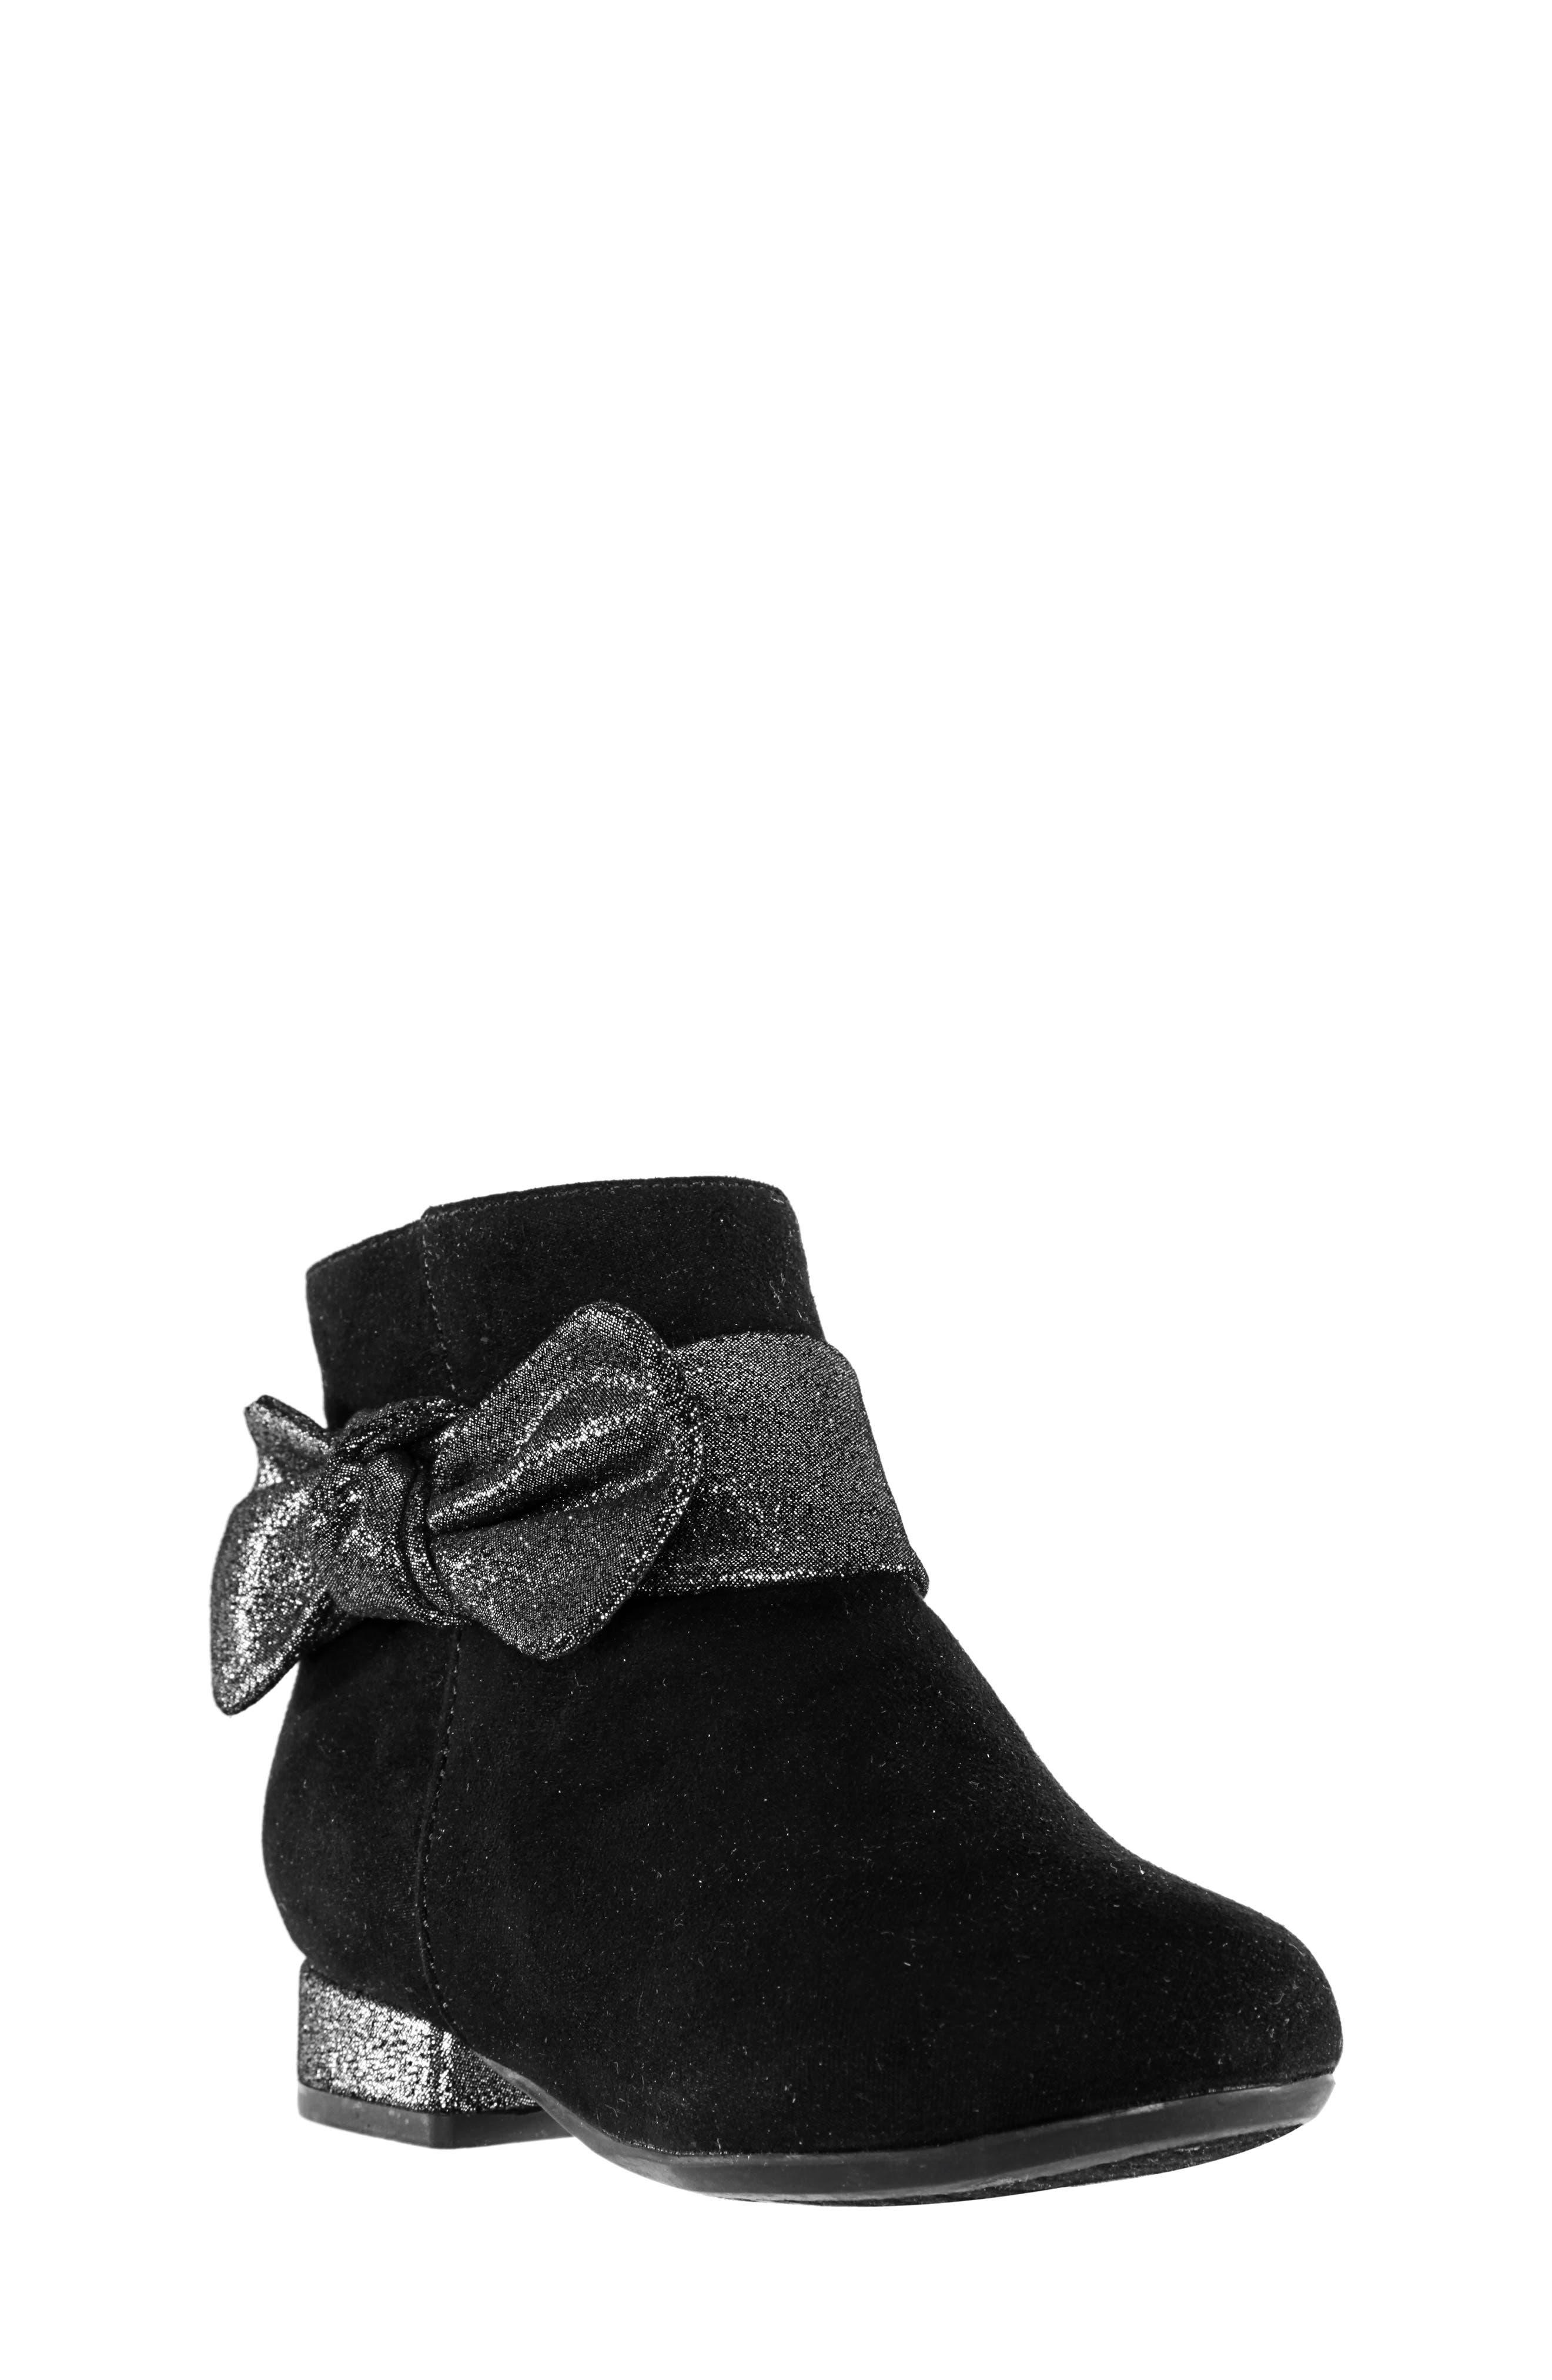 Evelin Block Heel Bootie,                             Main thumbnail 1, color,                             BLACK MICRO SUEDE